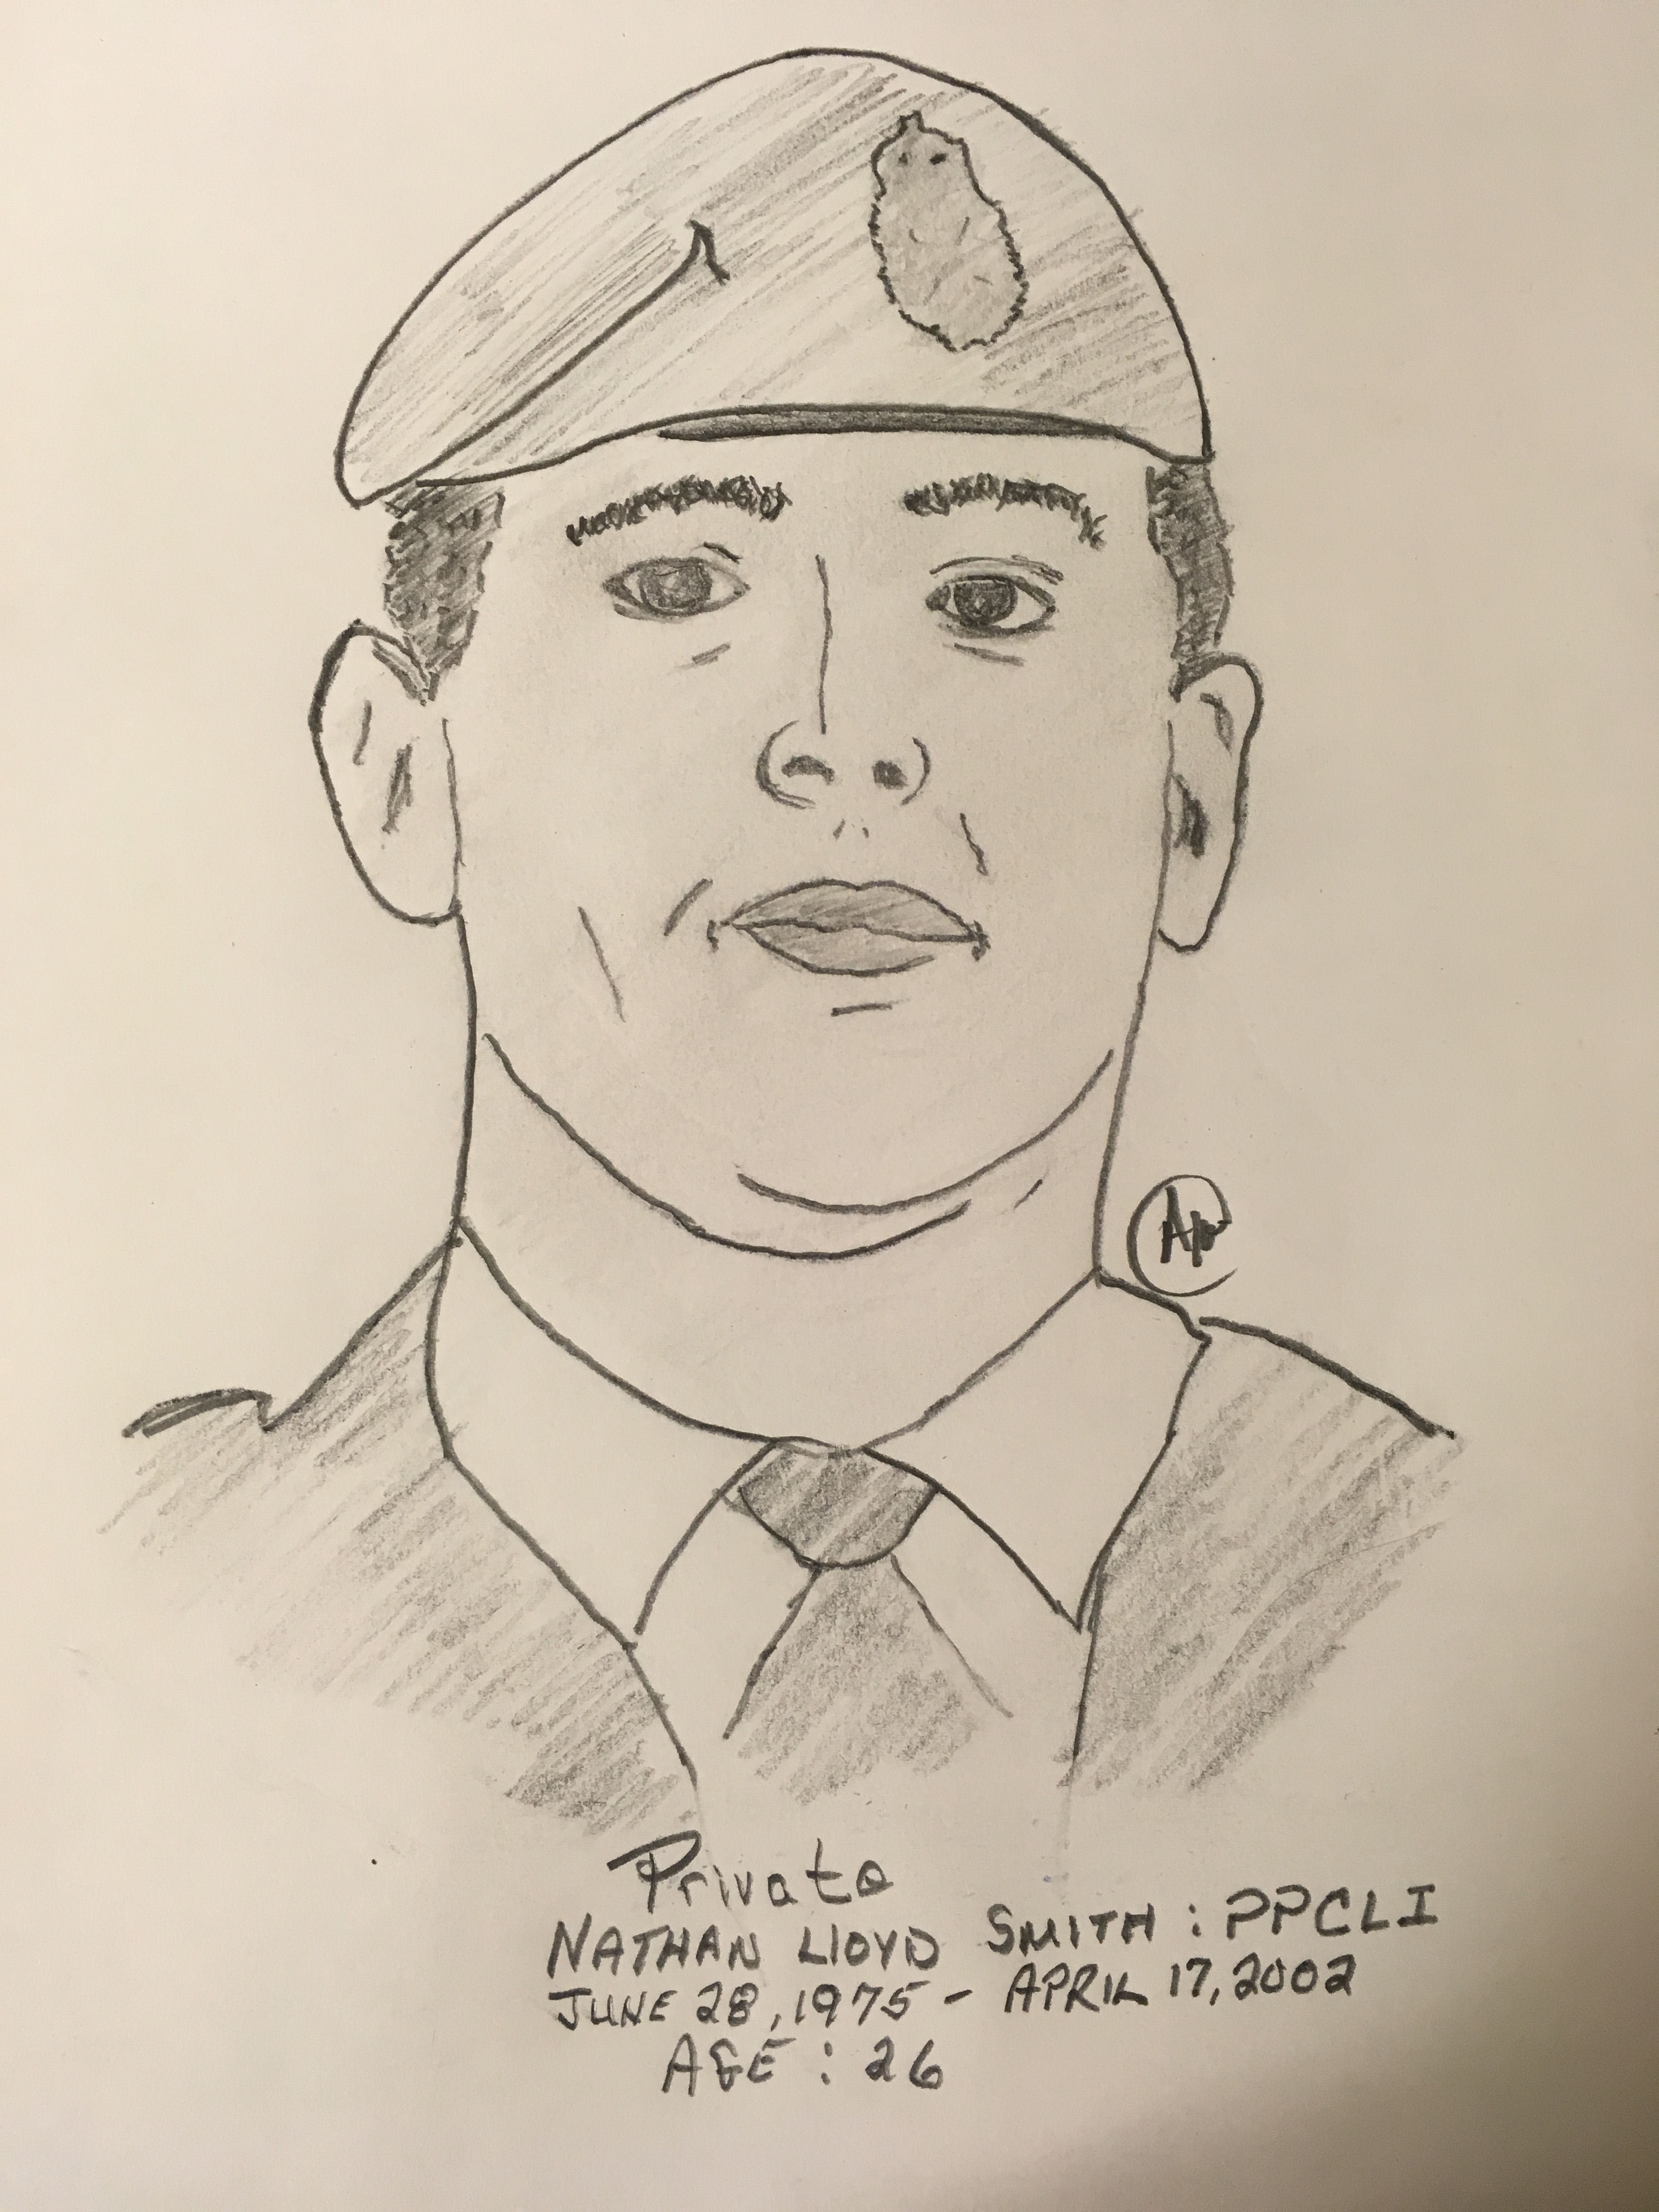 Personal sketch of a fallen comrade